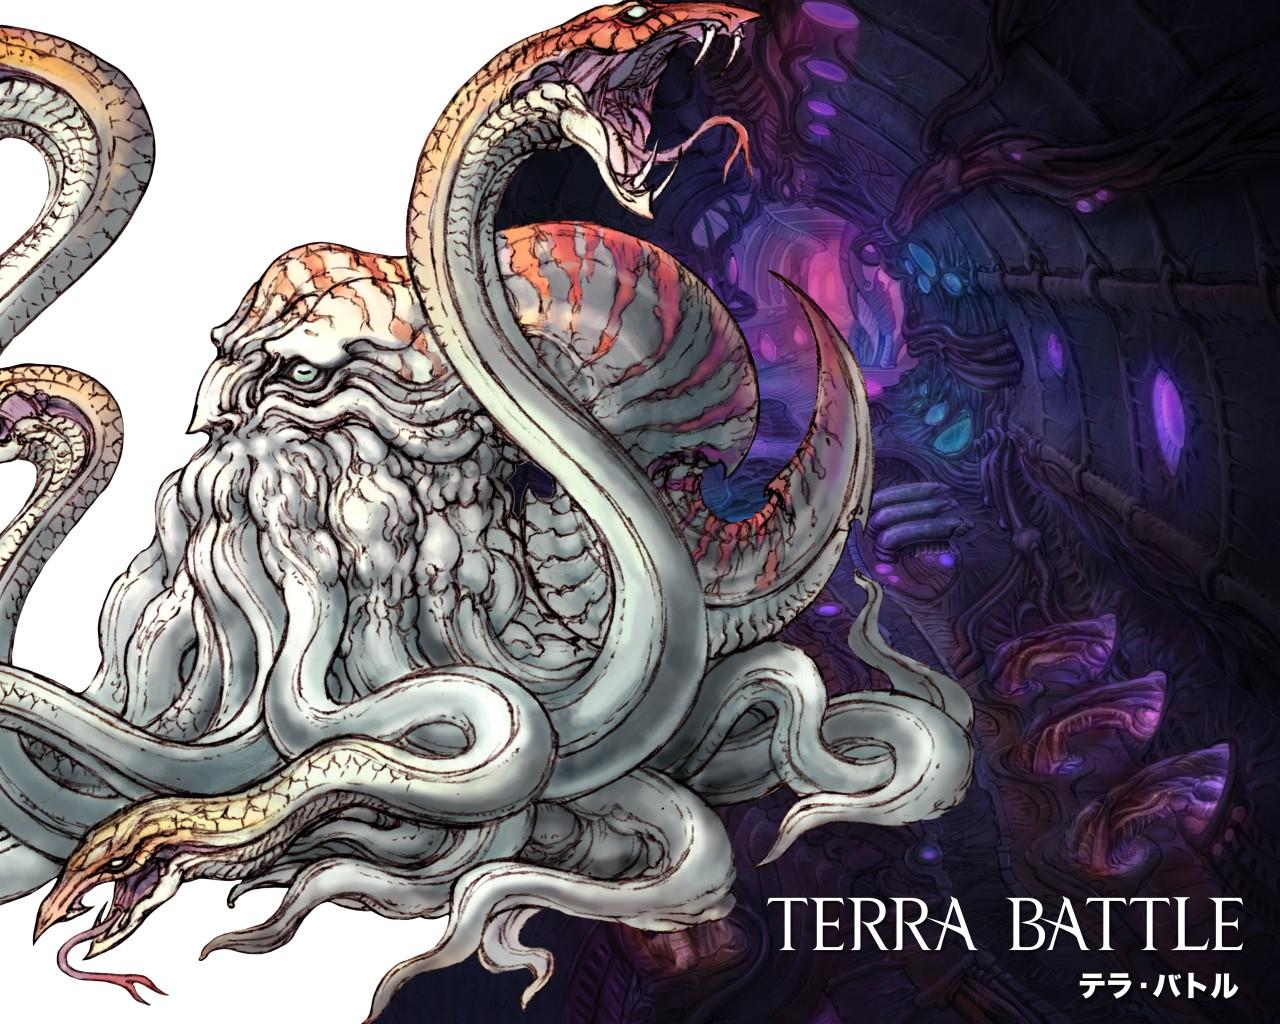 Terra-Battle_2014_08-27-14_022